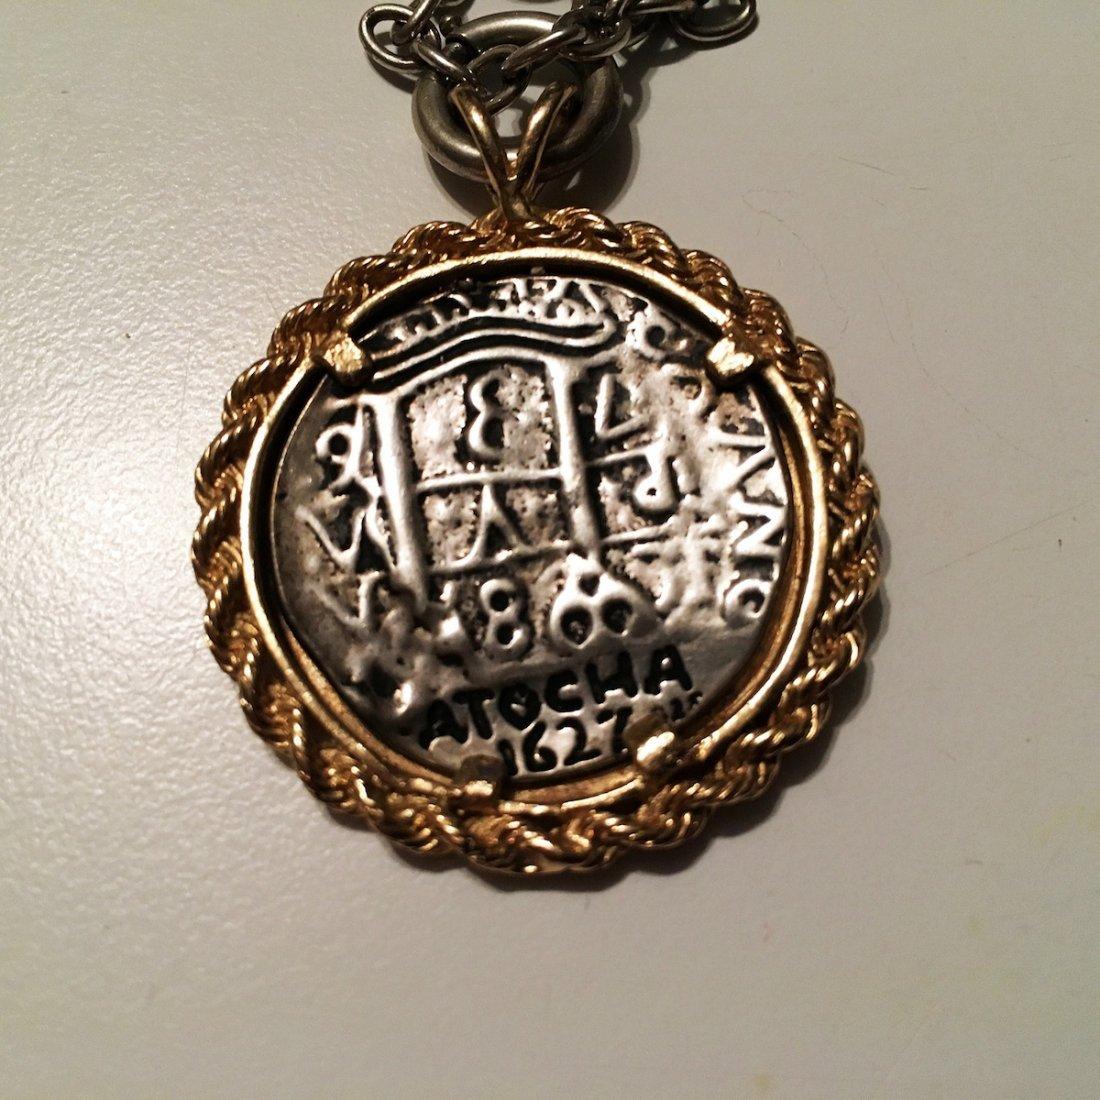 Atocha 1627 shipwreck silver and gold coin pendant - 3